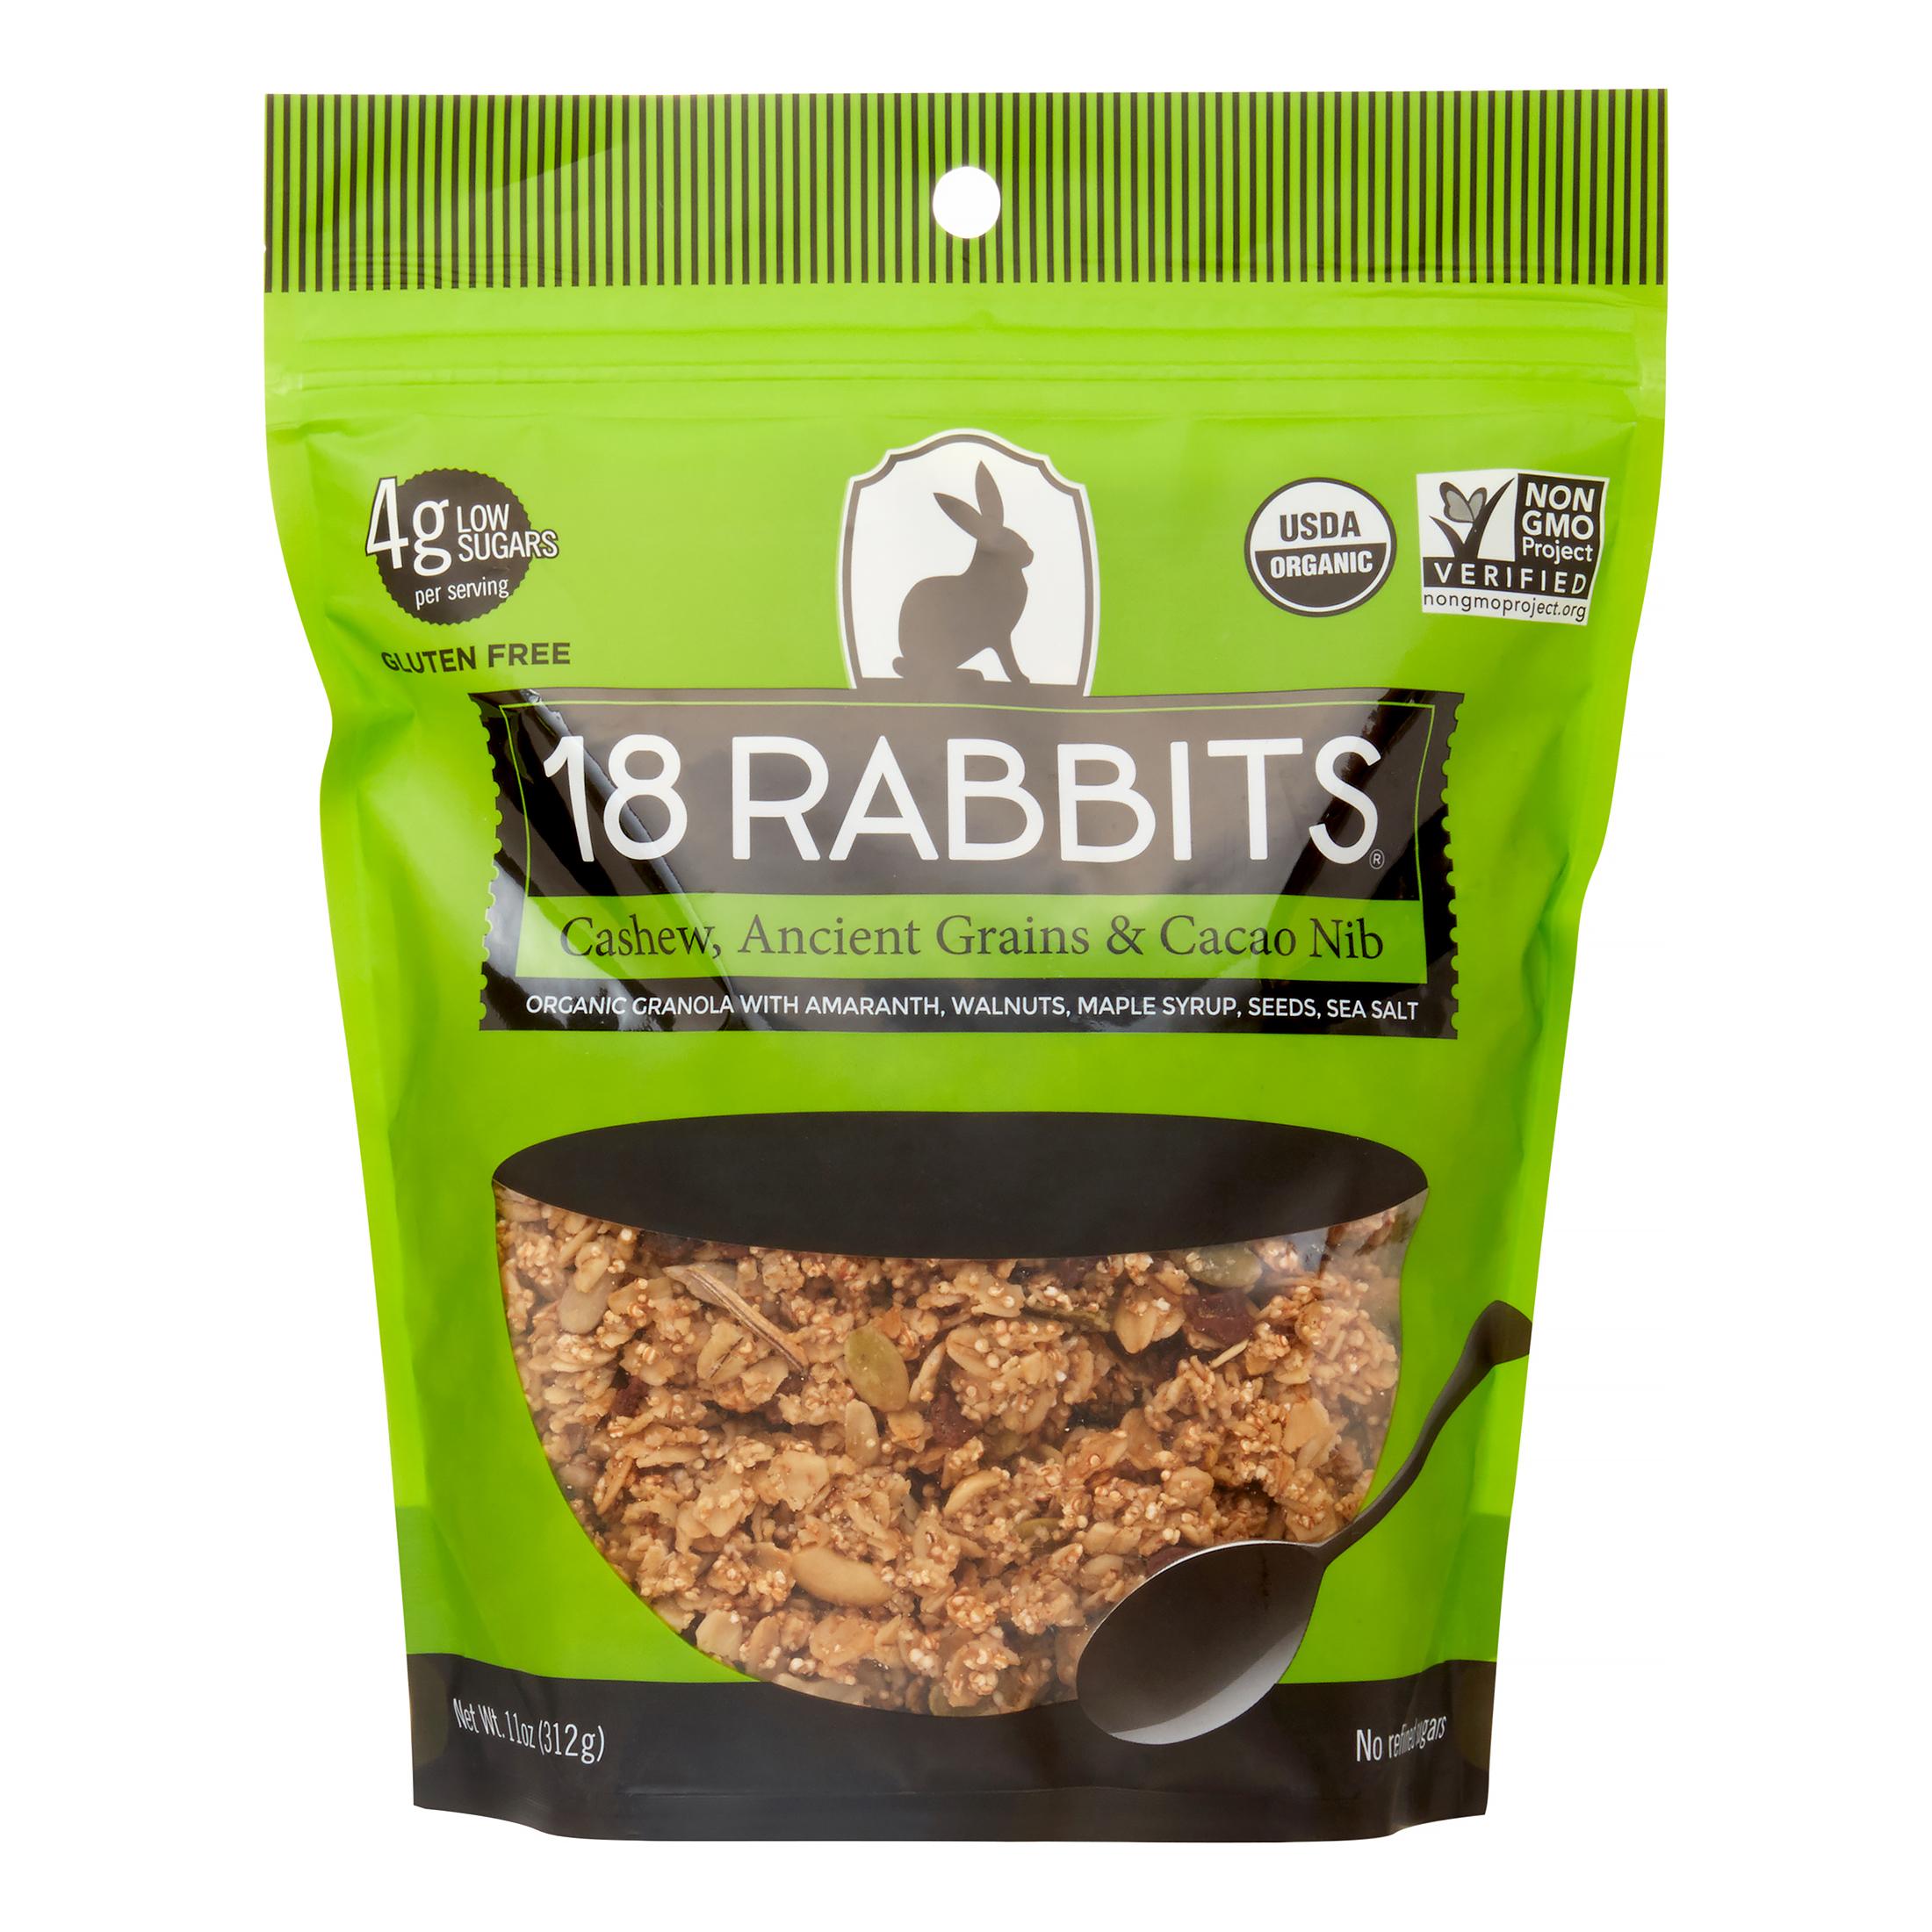 Image of 18 Rabbits Audacia Organic Granola, 11 Oz